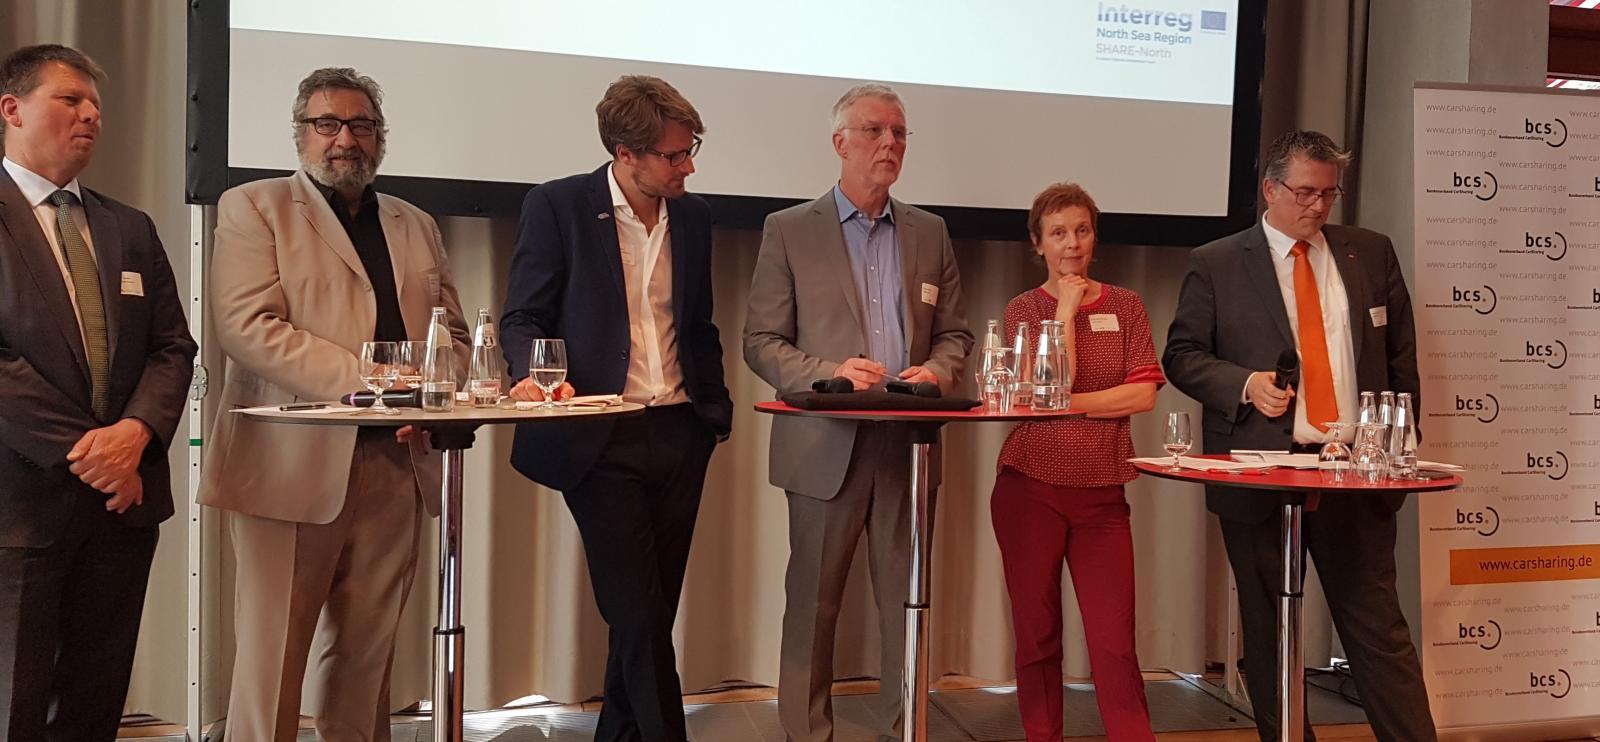 v.l.n.r: Dr. Joachim Lohse, Prof. Dr. Klaus Beckmann, Wasilis von Rauch, MdB Arno Klare, MdB Sabine Leidig, MdB Michael Donth (Foto: Michael Glotz-Richter)